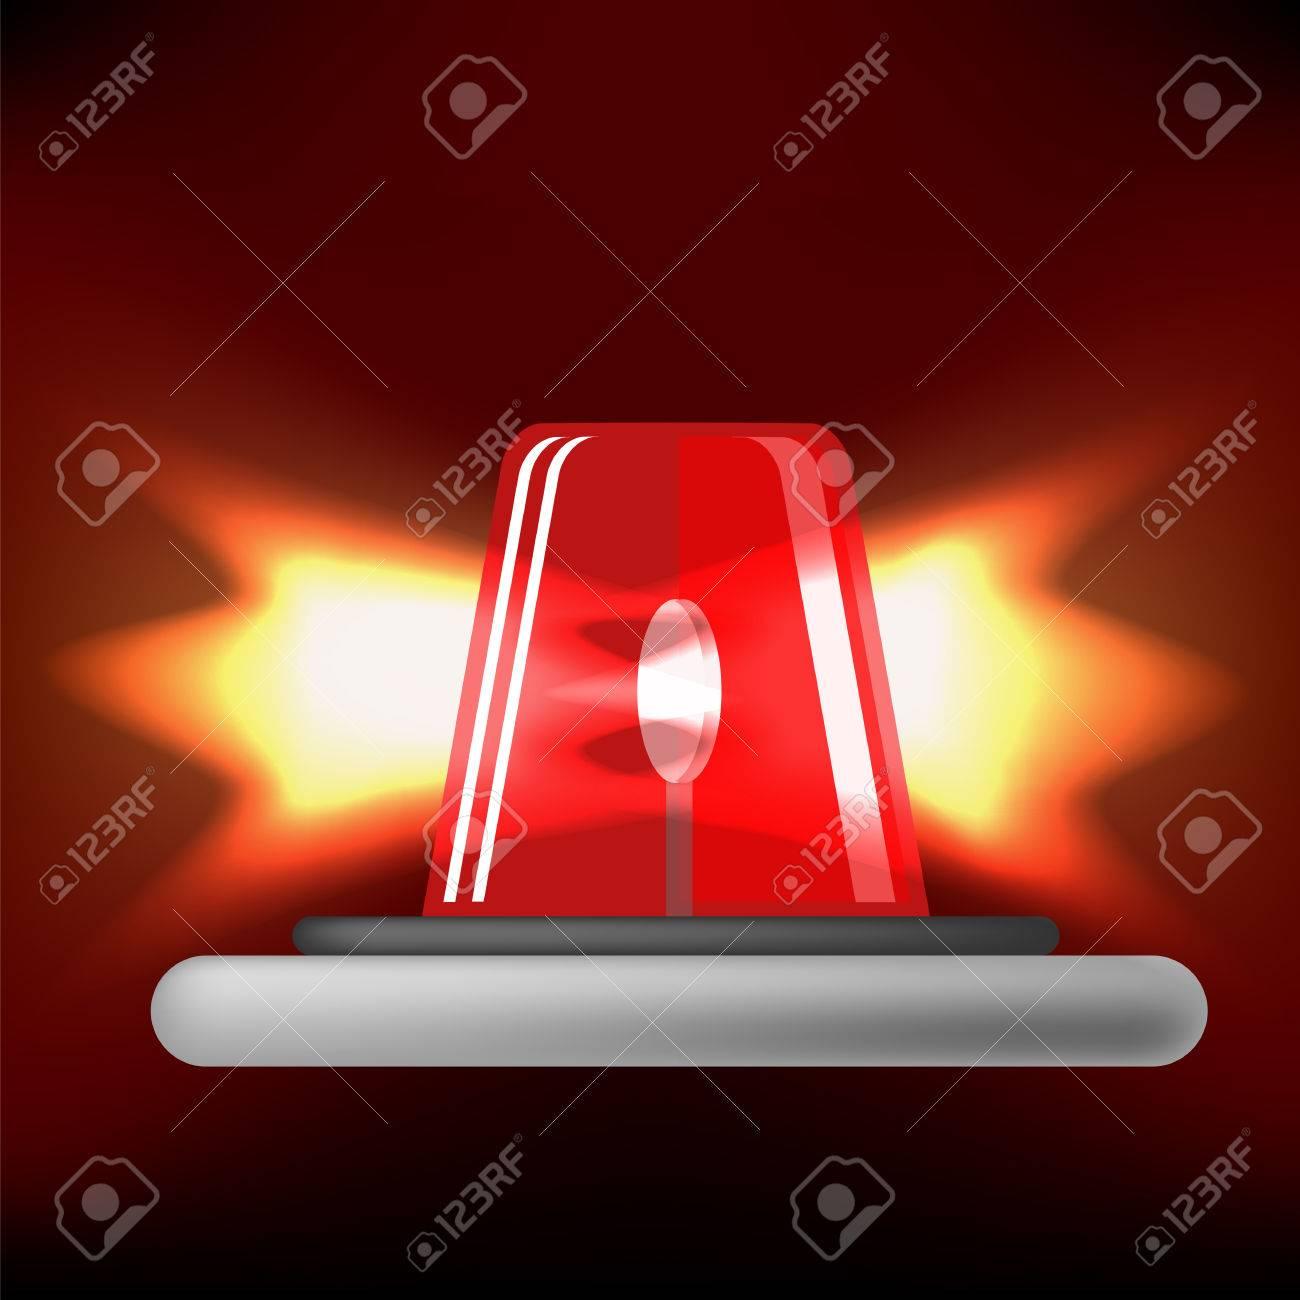 Siren Icon Isolated On Black Background Red Emergency Flash Car Light And Alarm Symbol Zdjcie Seryjne